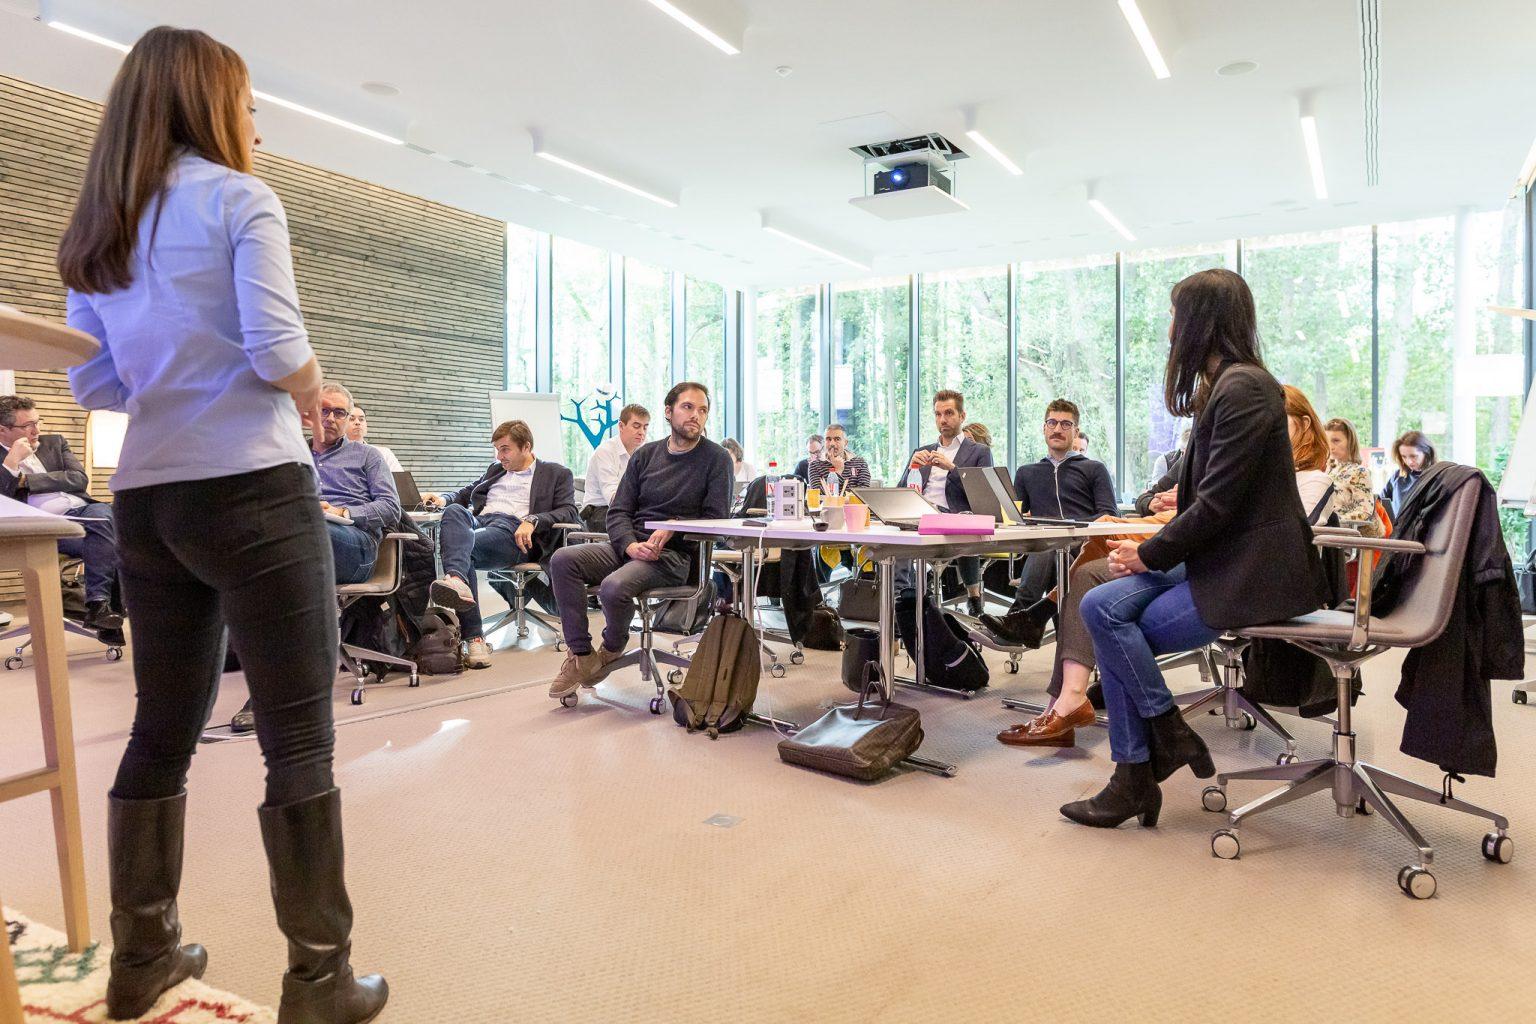 photographe team building reportage corporate paris